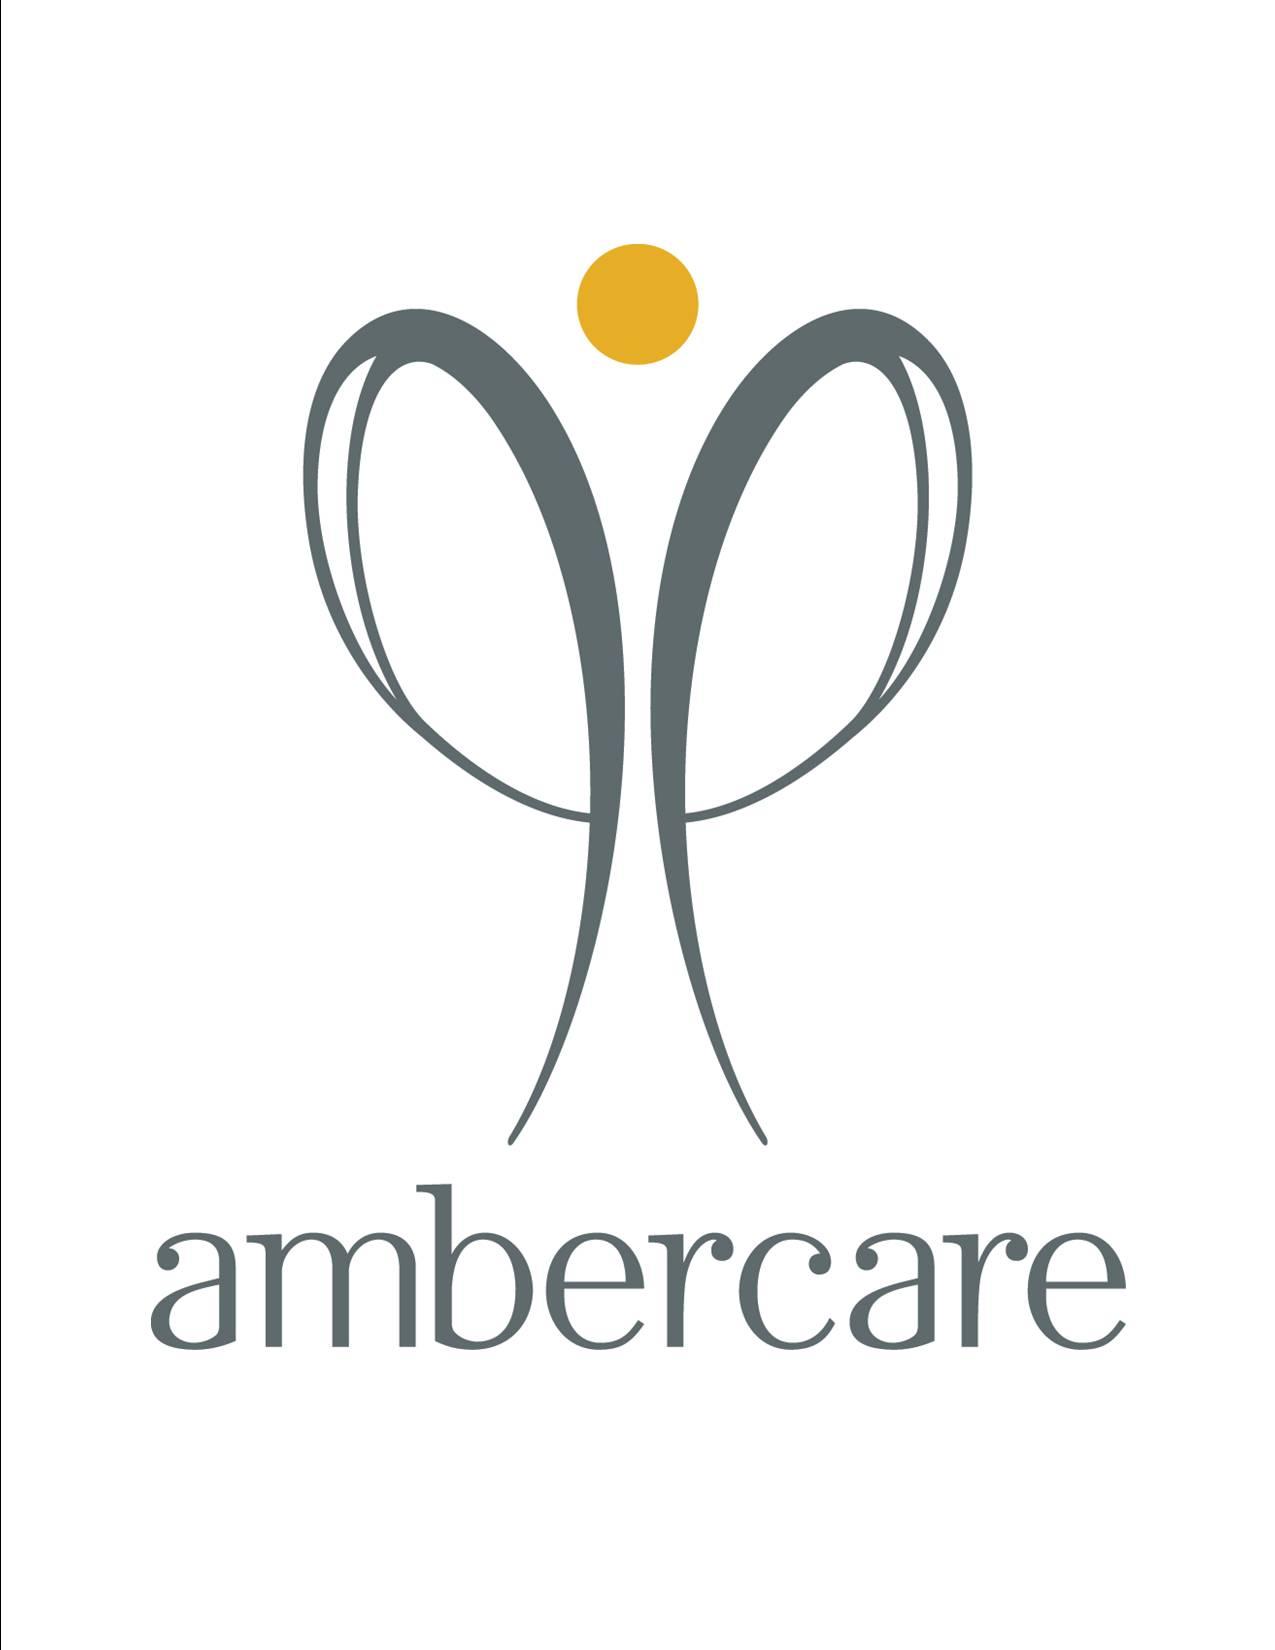 Ambercare logo